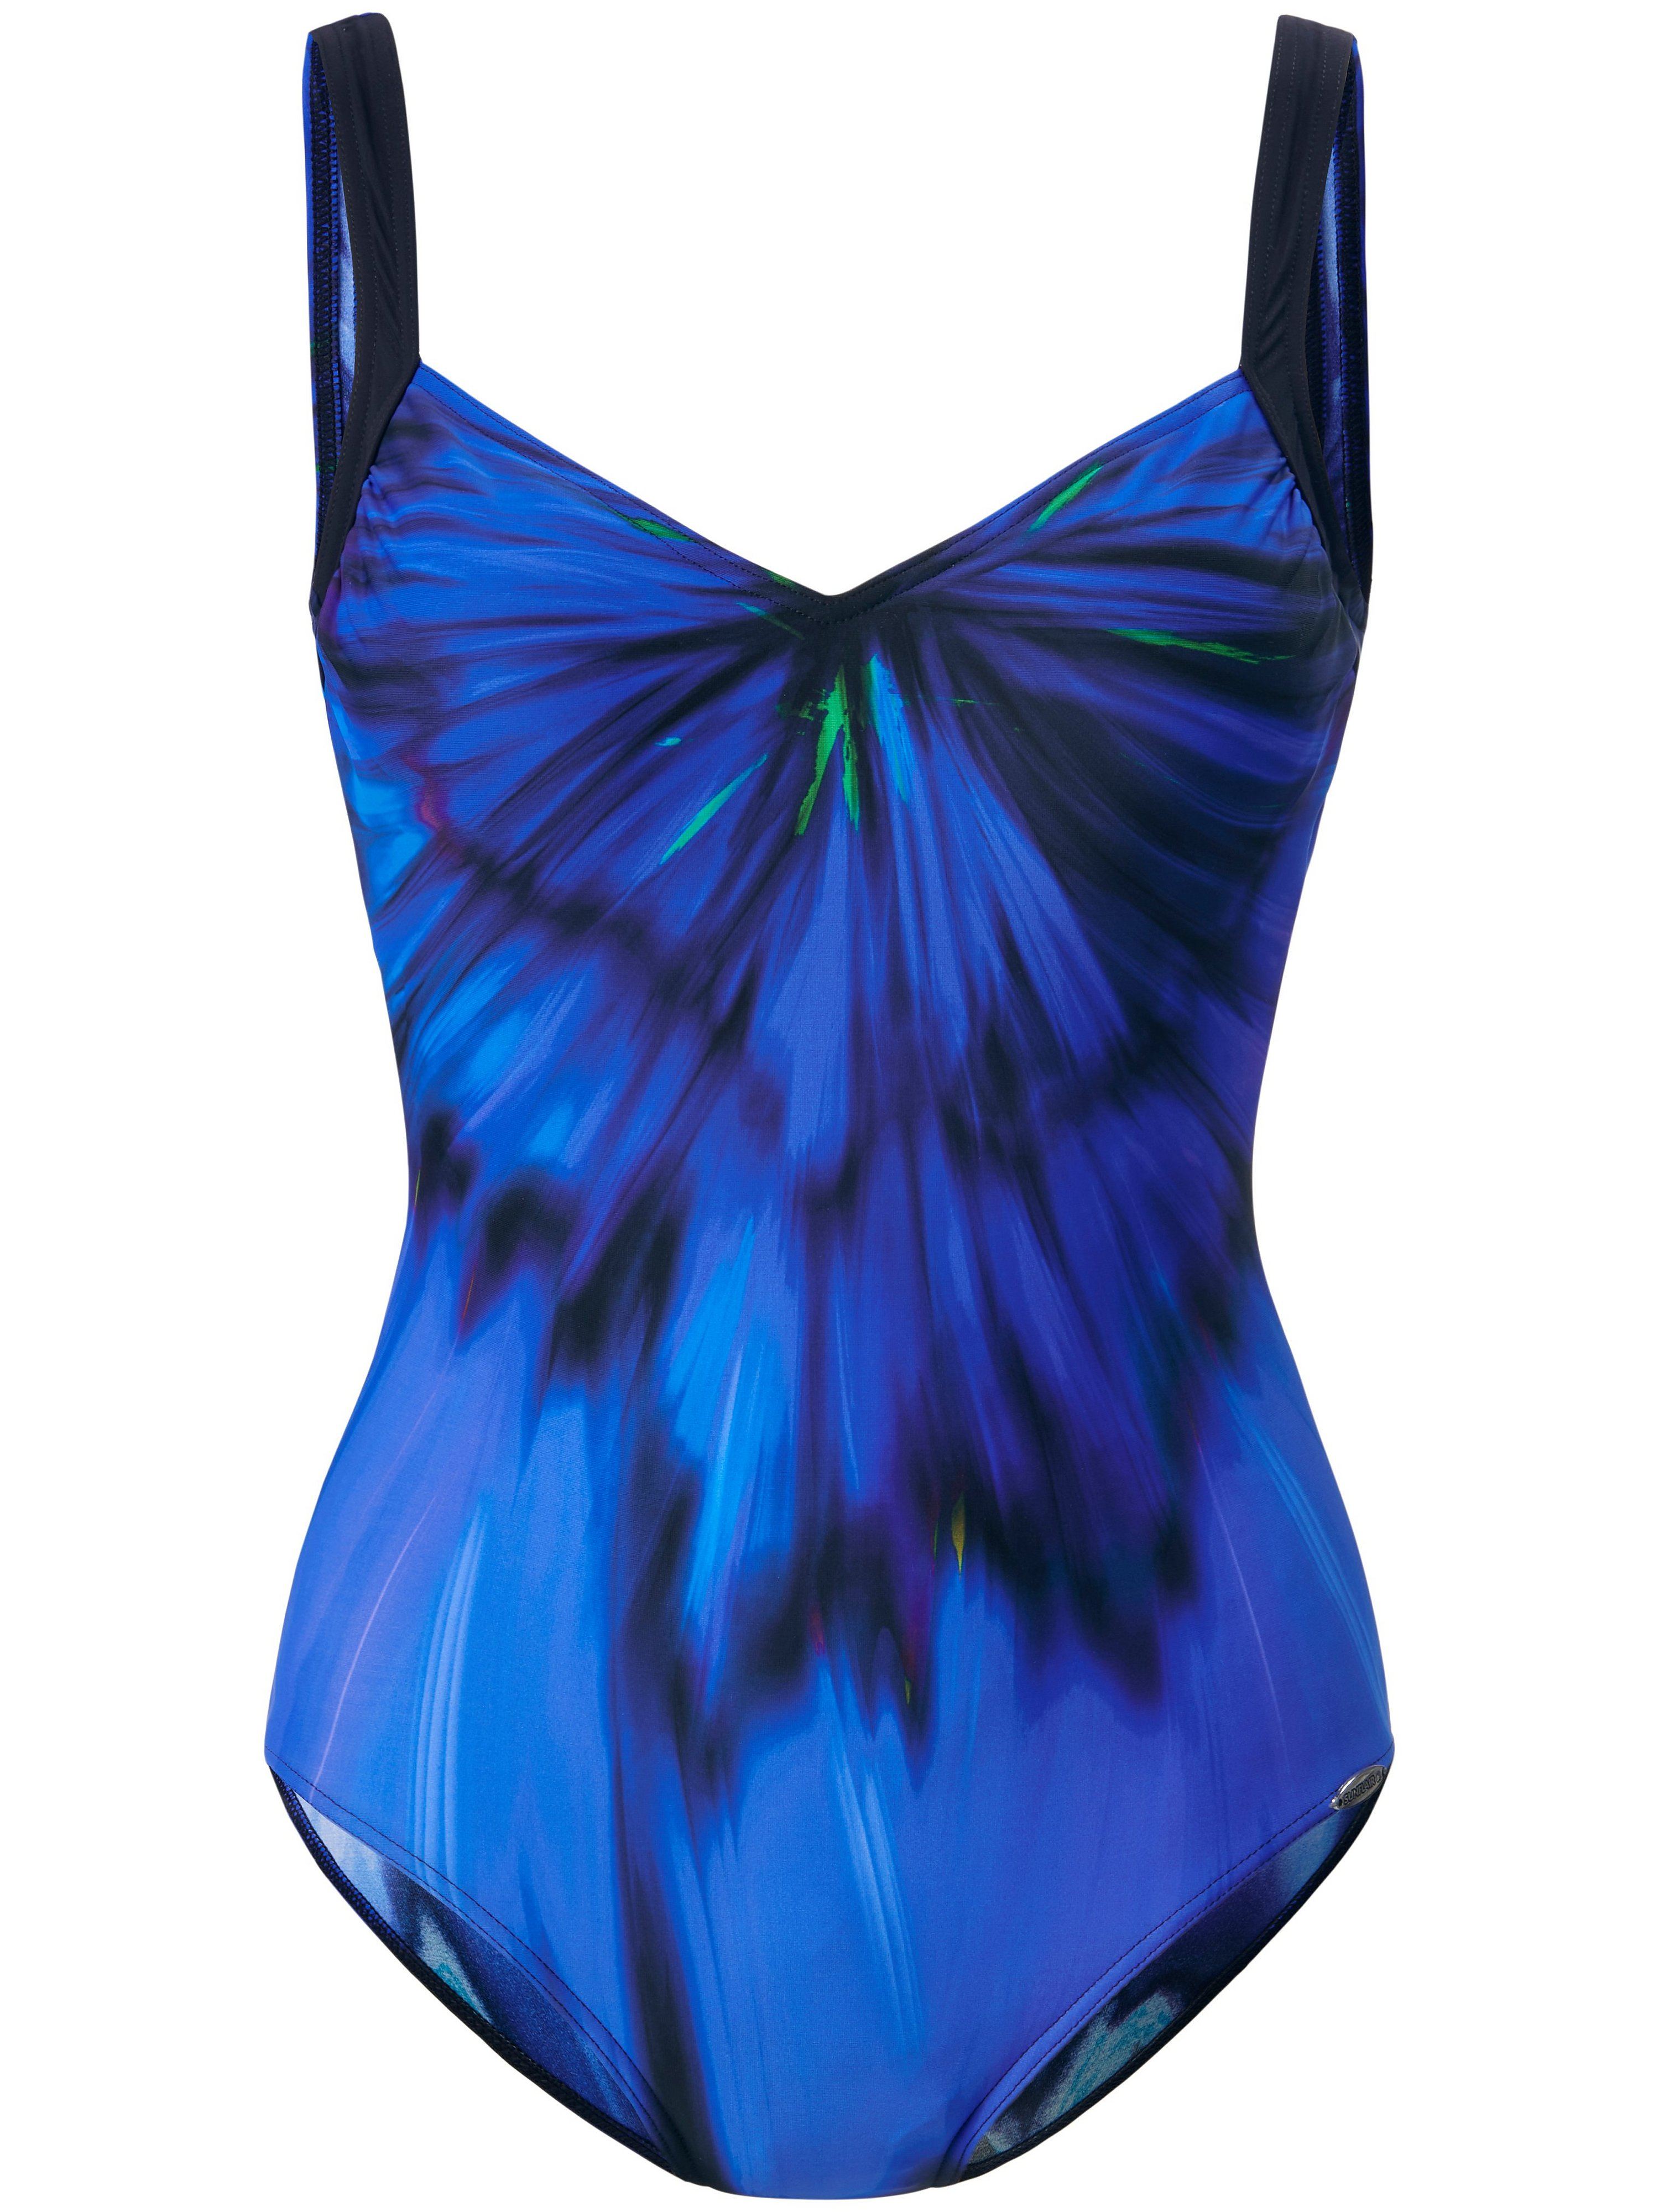 Badpak Van Sunflair blauw